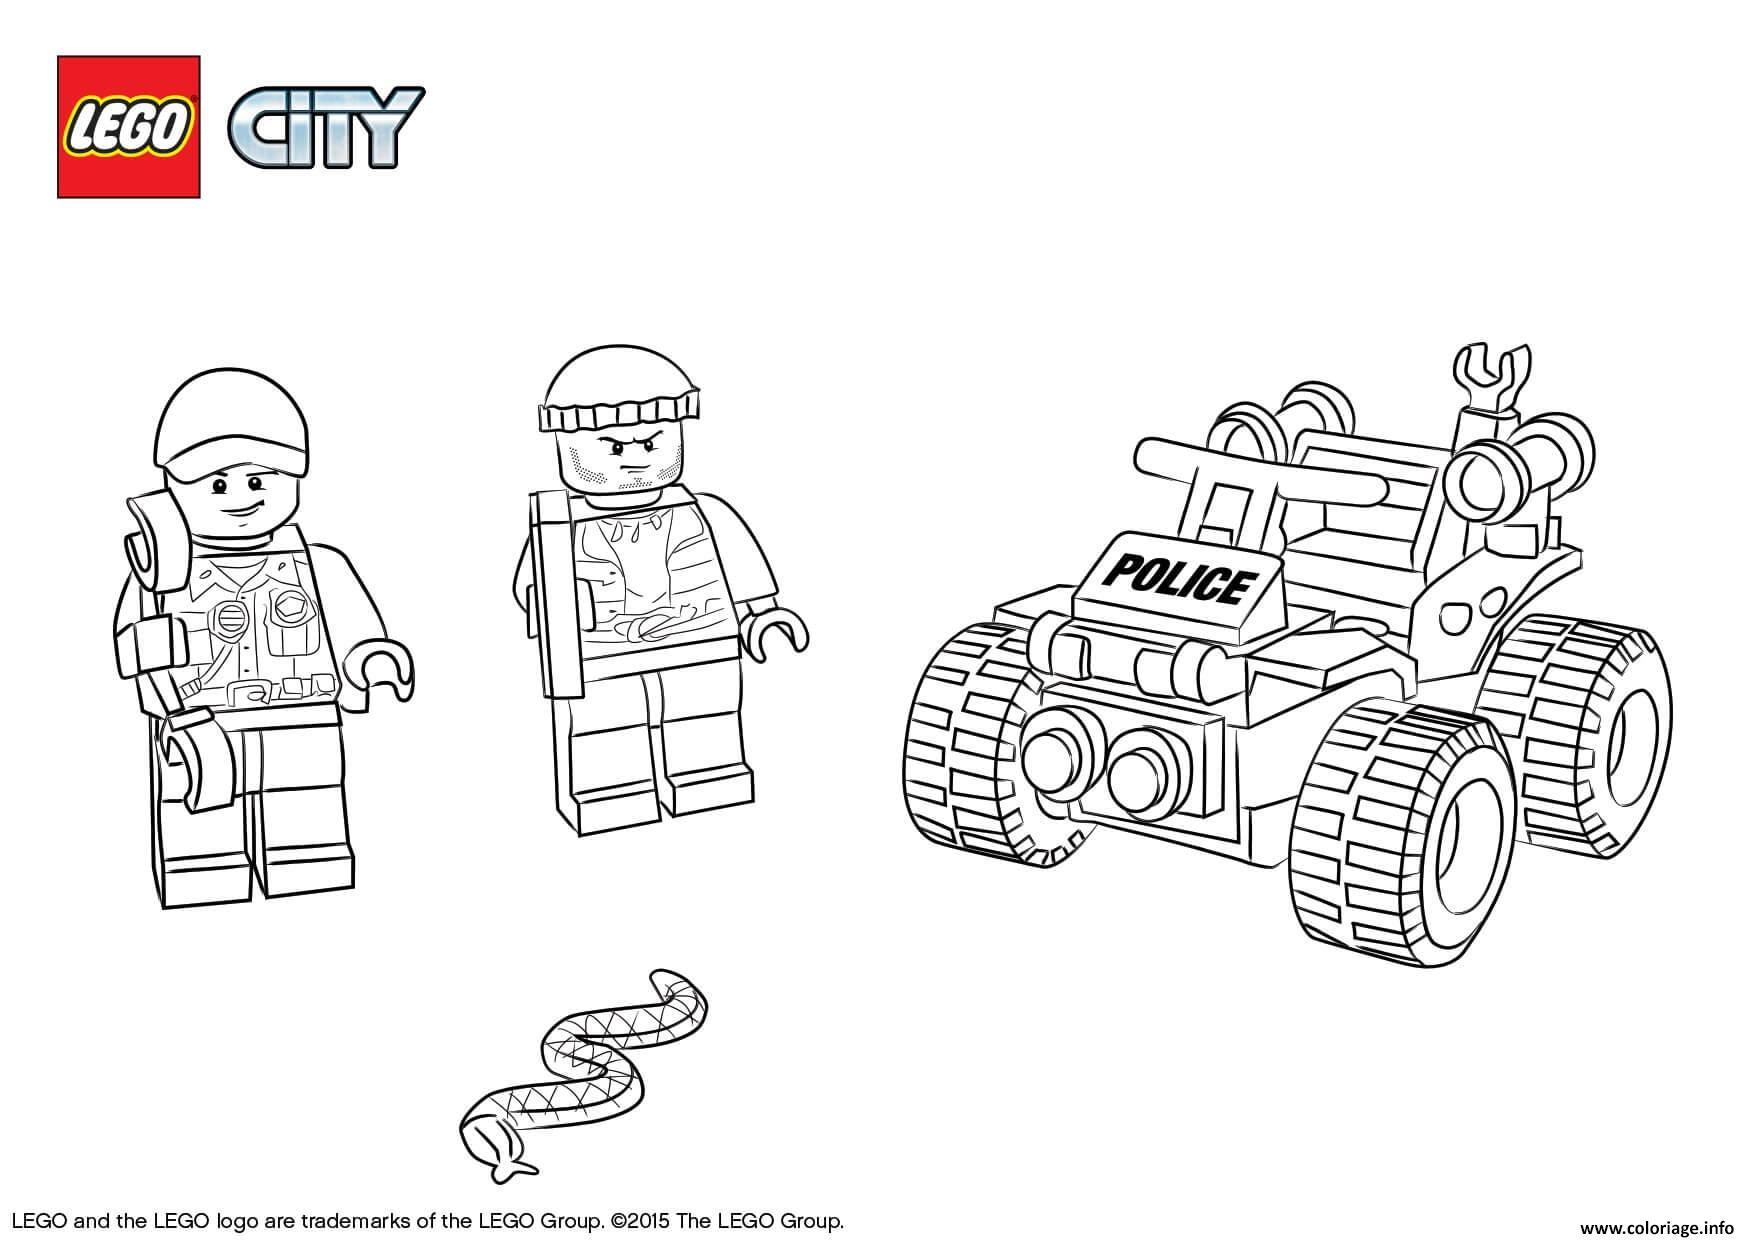 Coloriage Lego City Atv Patrol Police Jecolorie Com